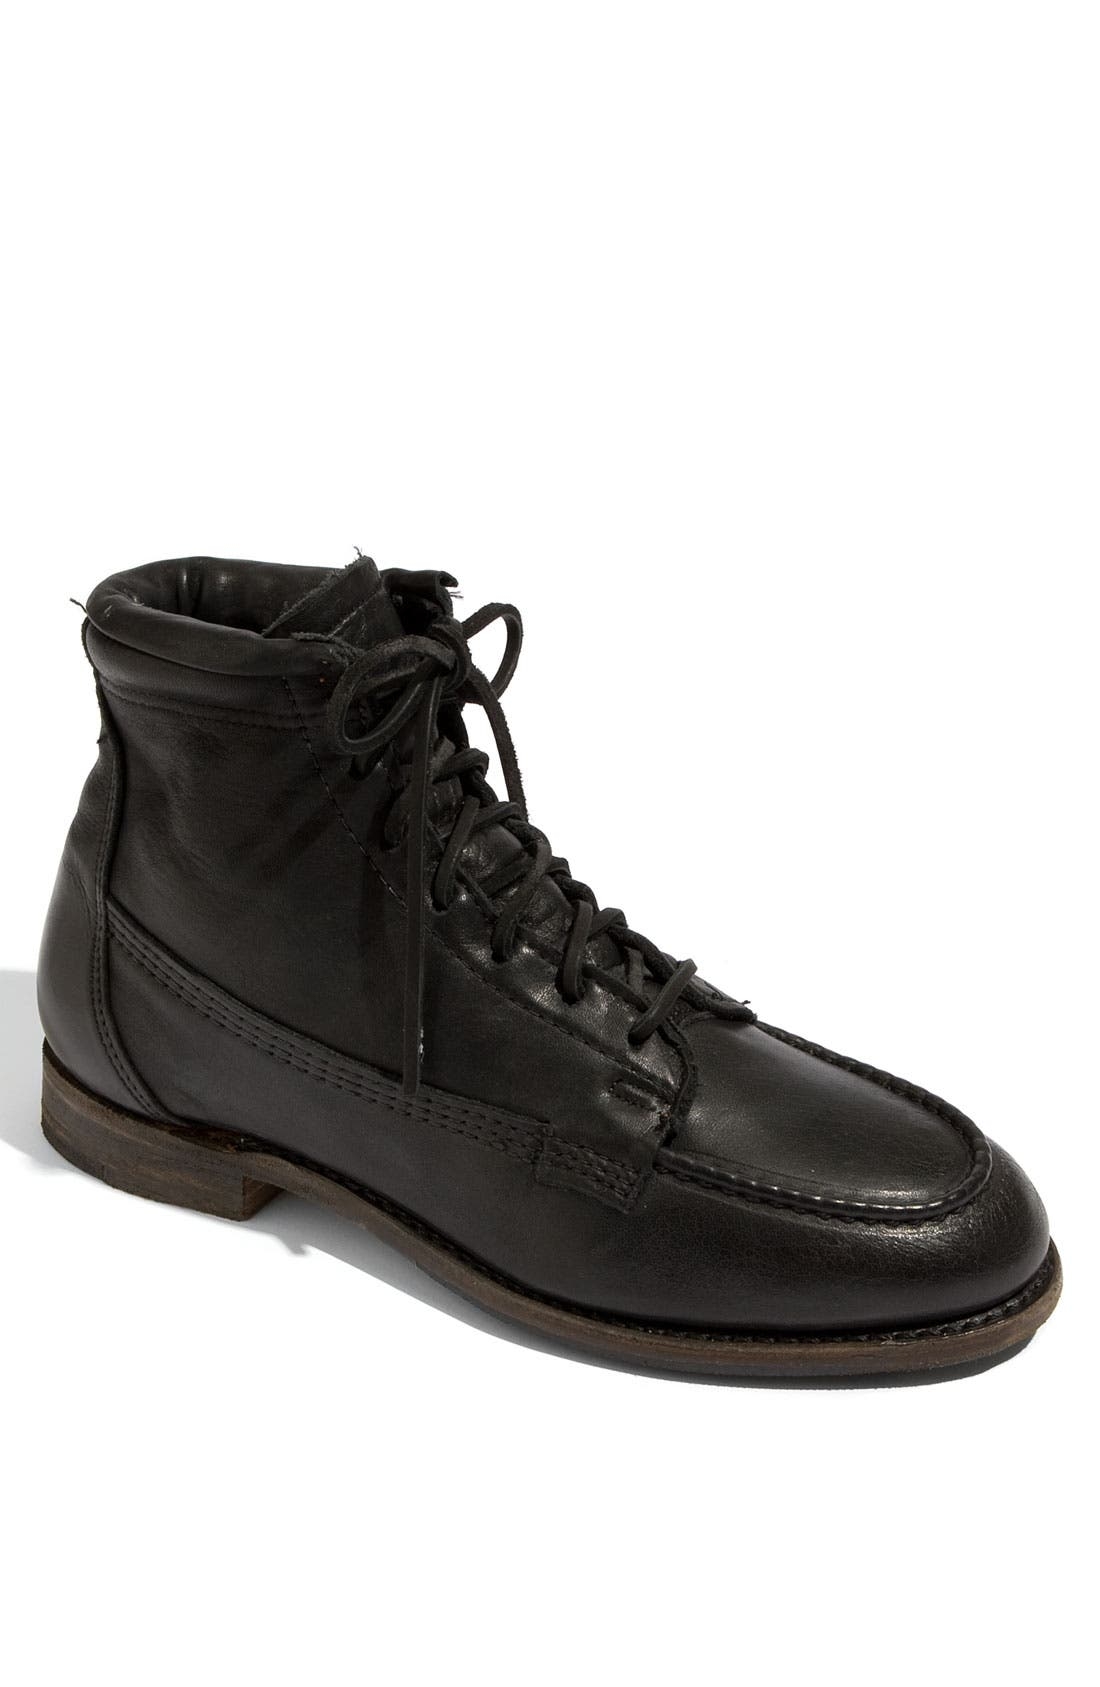 Alternate Image 1 Selected - Vintage Shoe Company 'Vincent' Boot